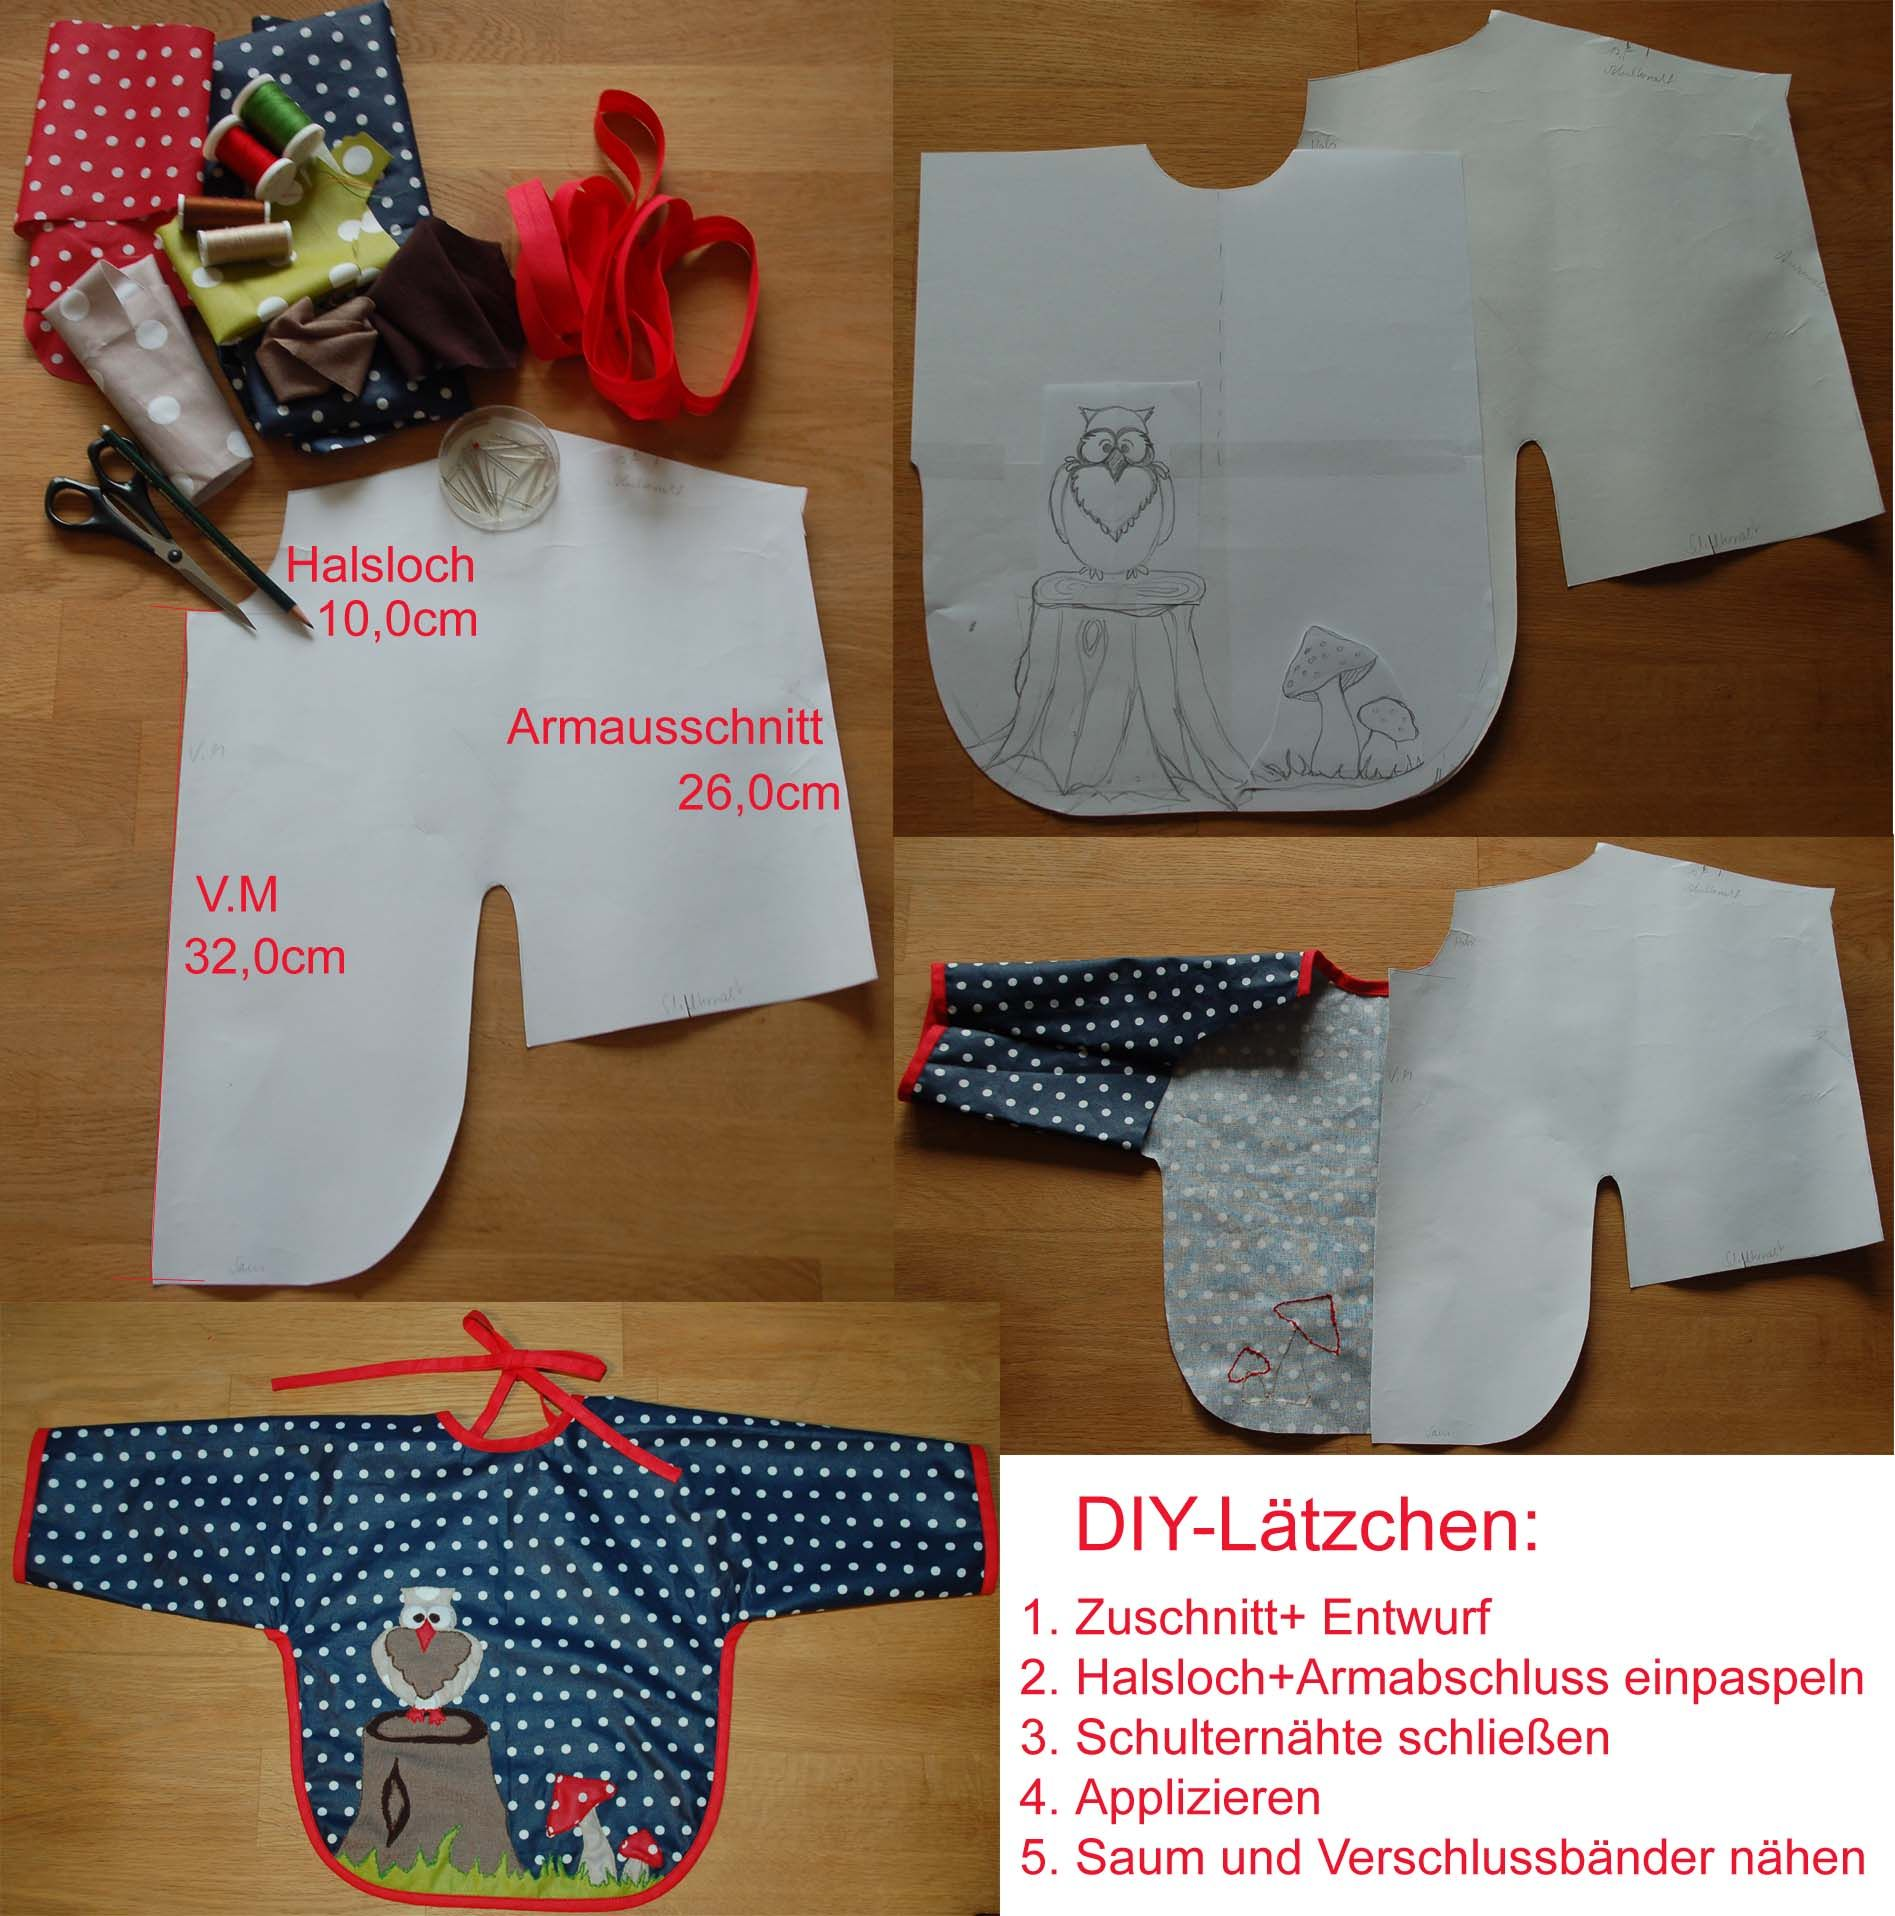 Lätzchen DIY